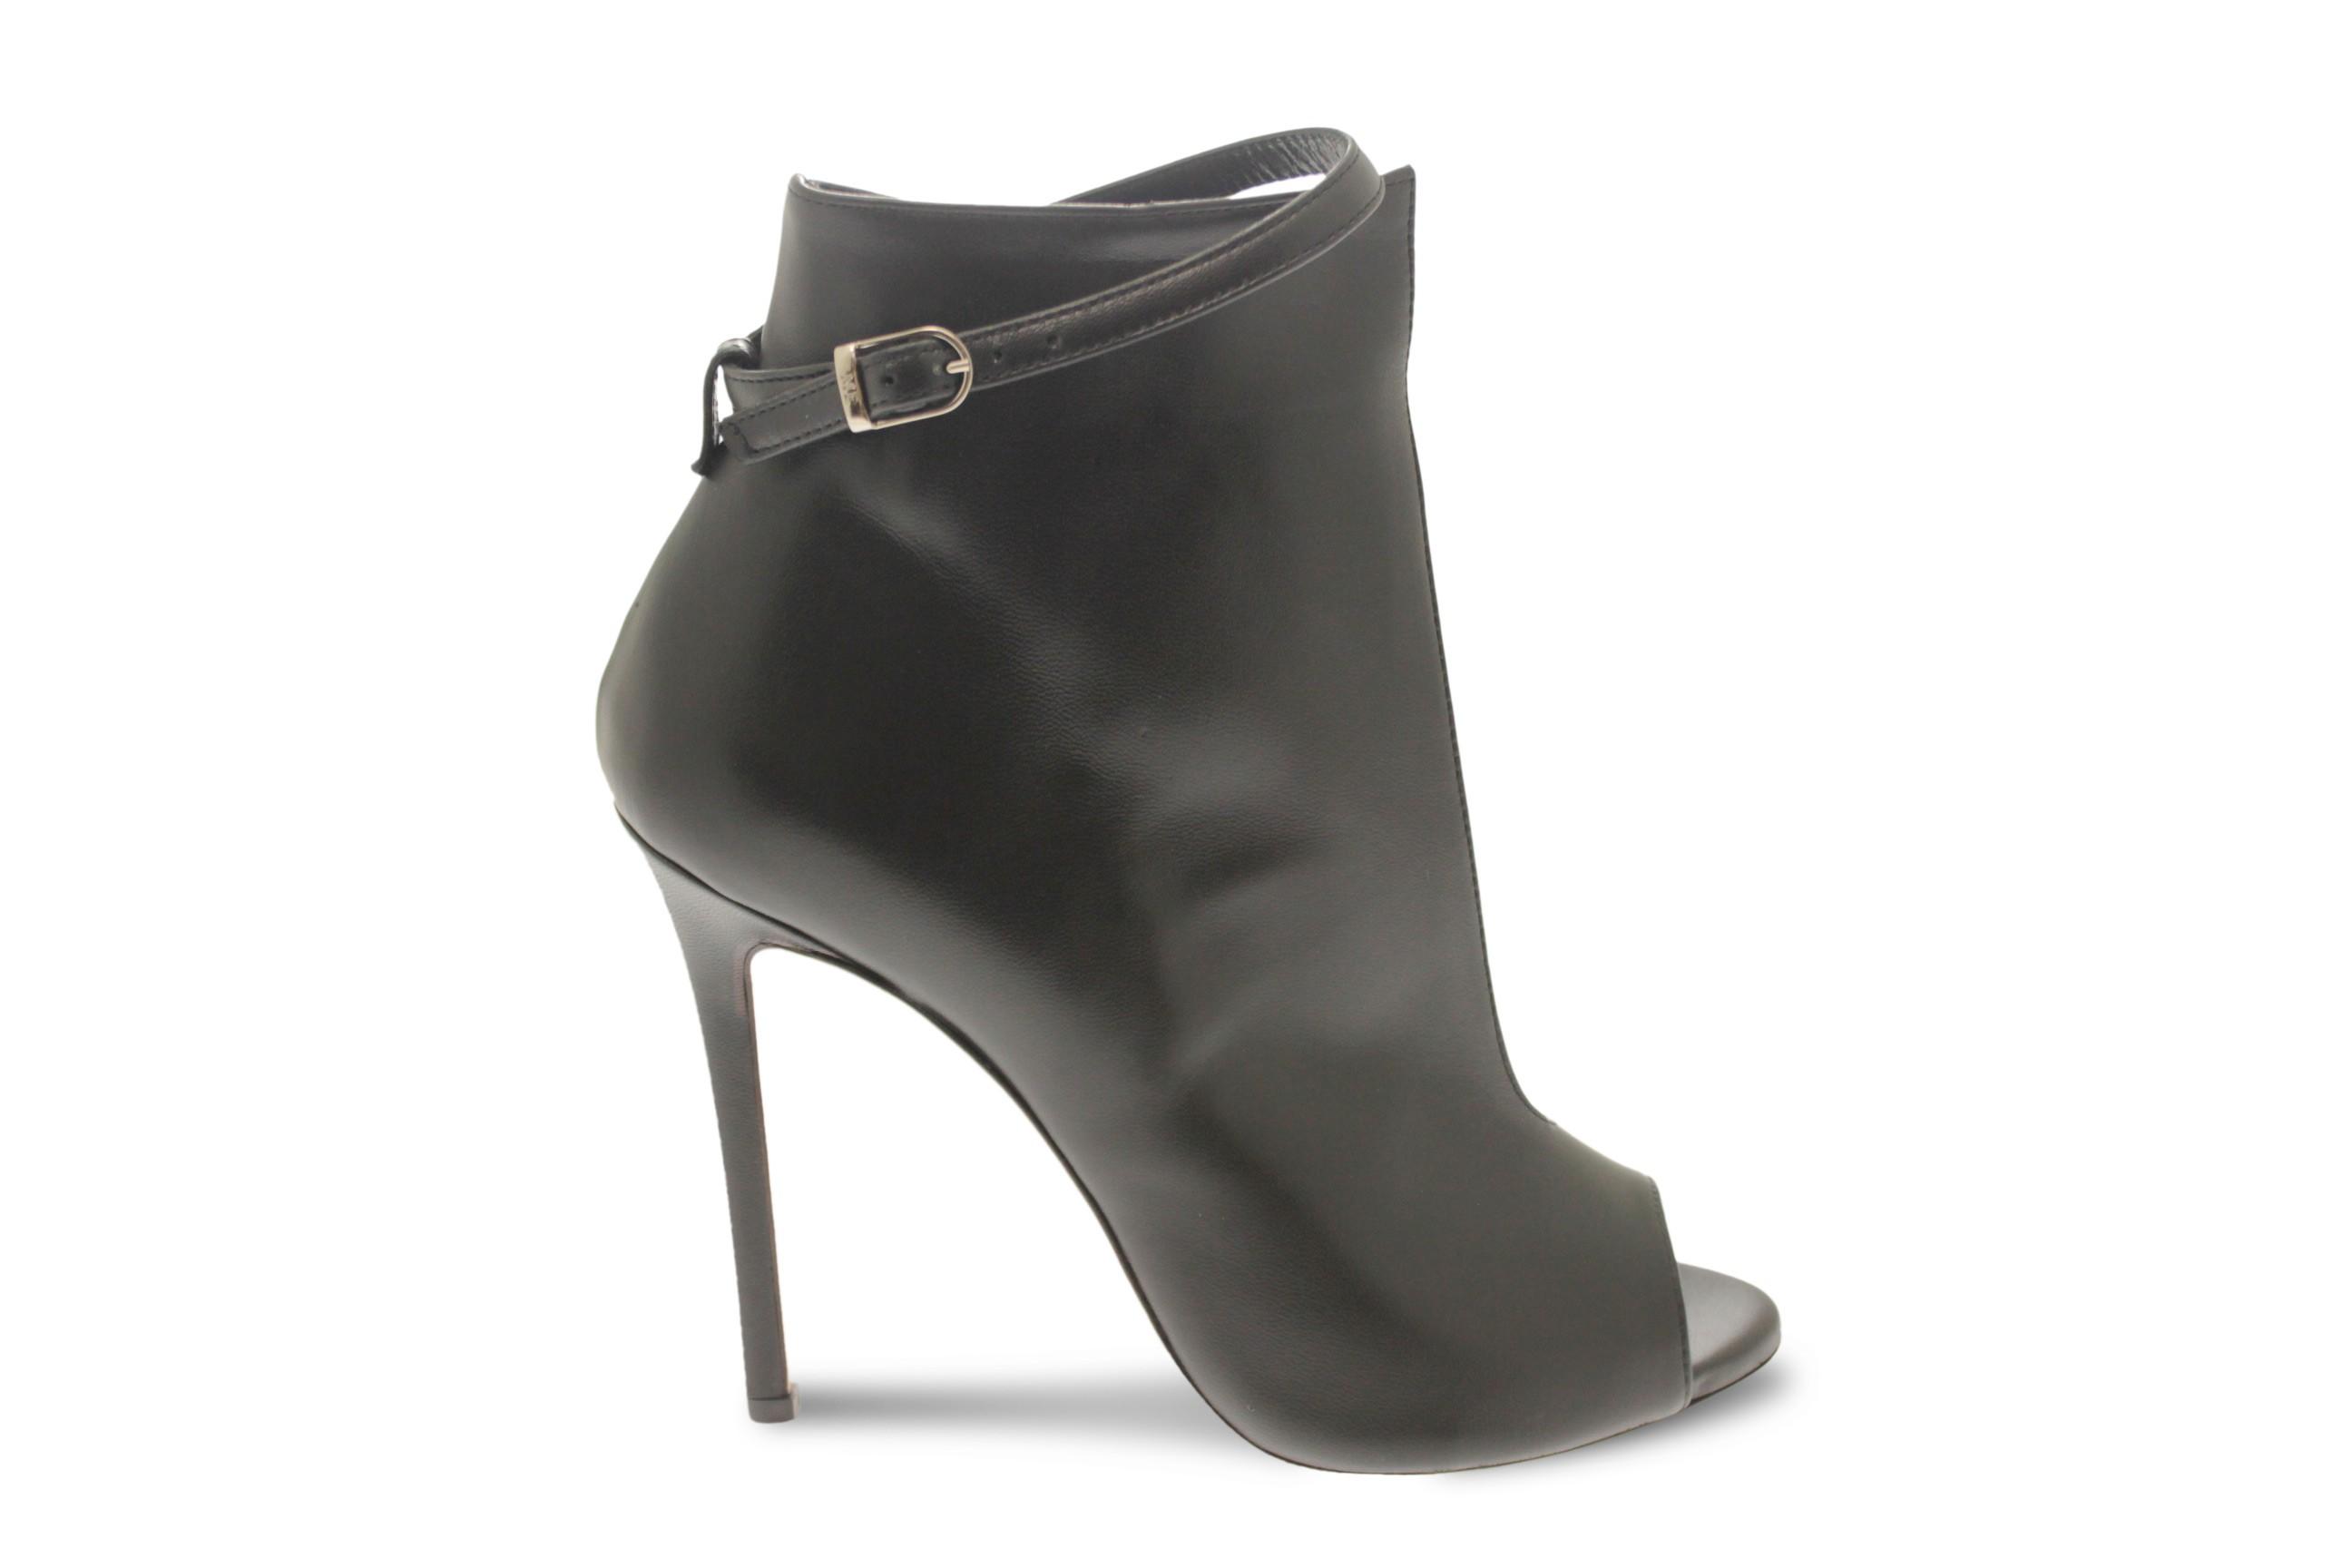 Modernecouturesublime cuir femme noir été bottine f7Ibv6gyY